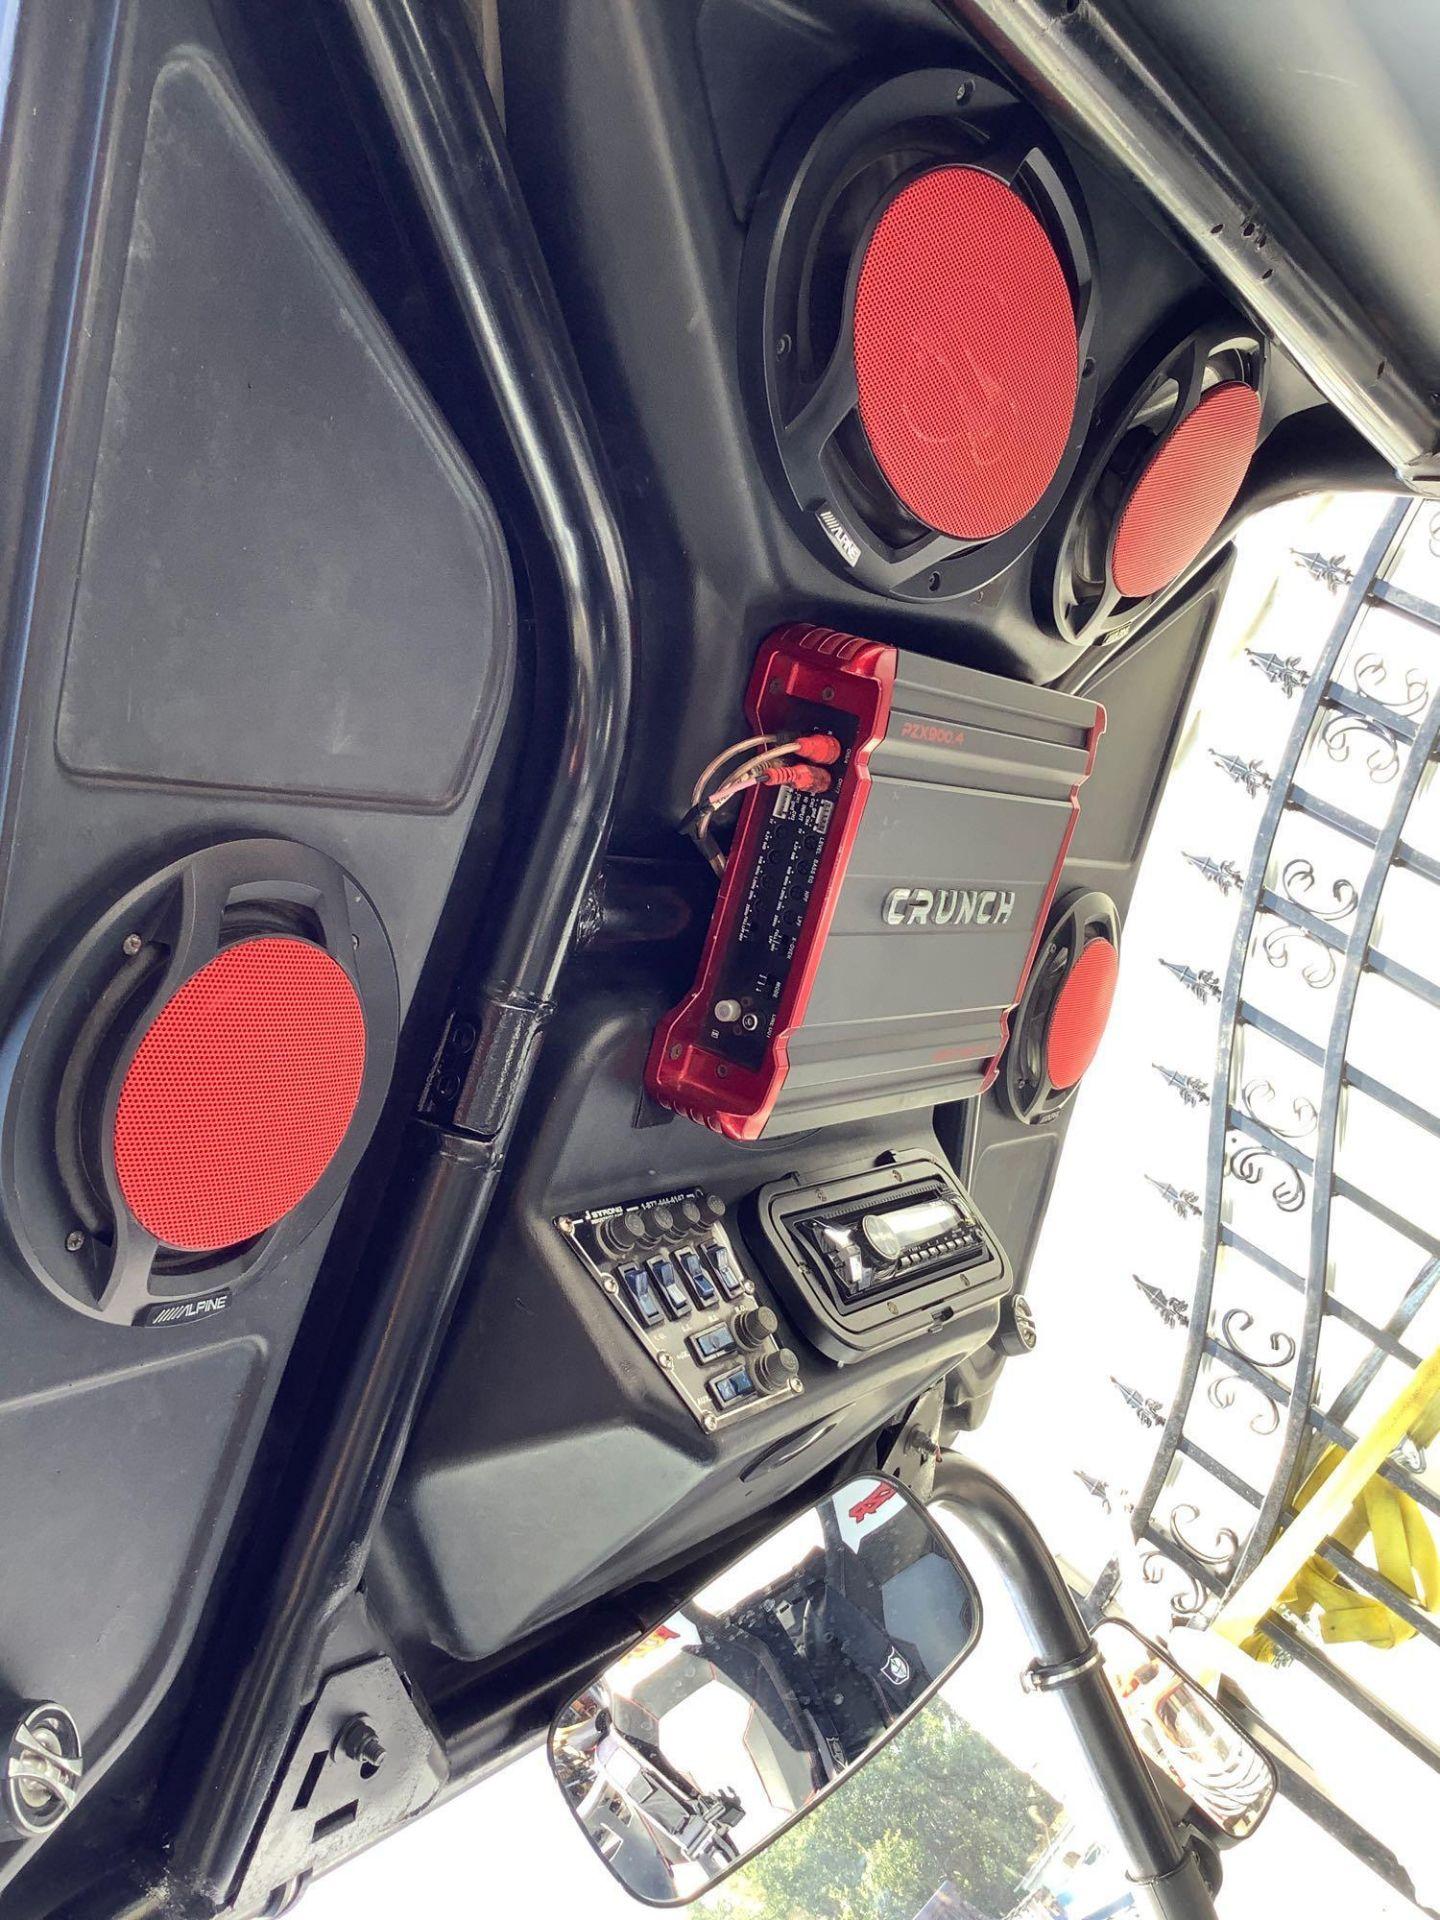 POLARIS RANGER RZR XP 900, TRINITY STAGE 5 RACING MUFFLER, SNORKEL INTAKE, CRUNCH 900 WATTS AMPLIFY - Image 17 of 22